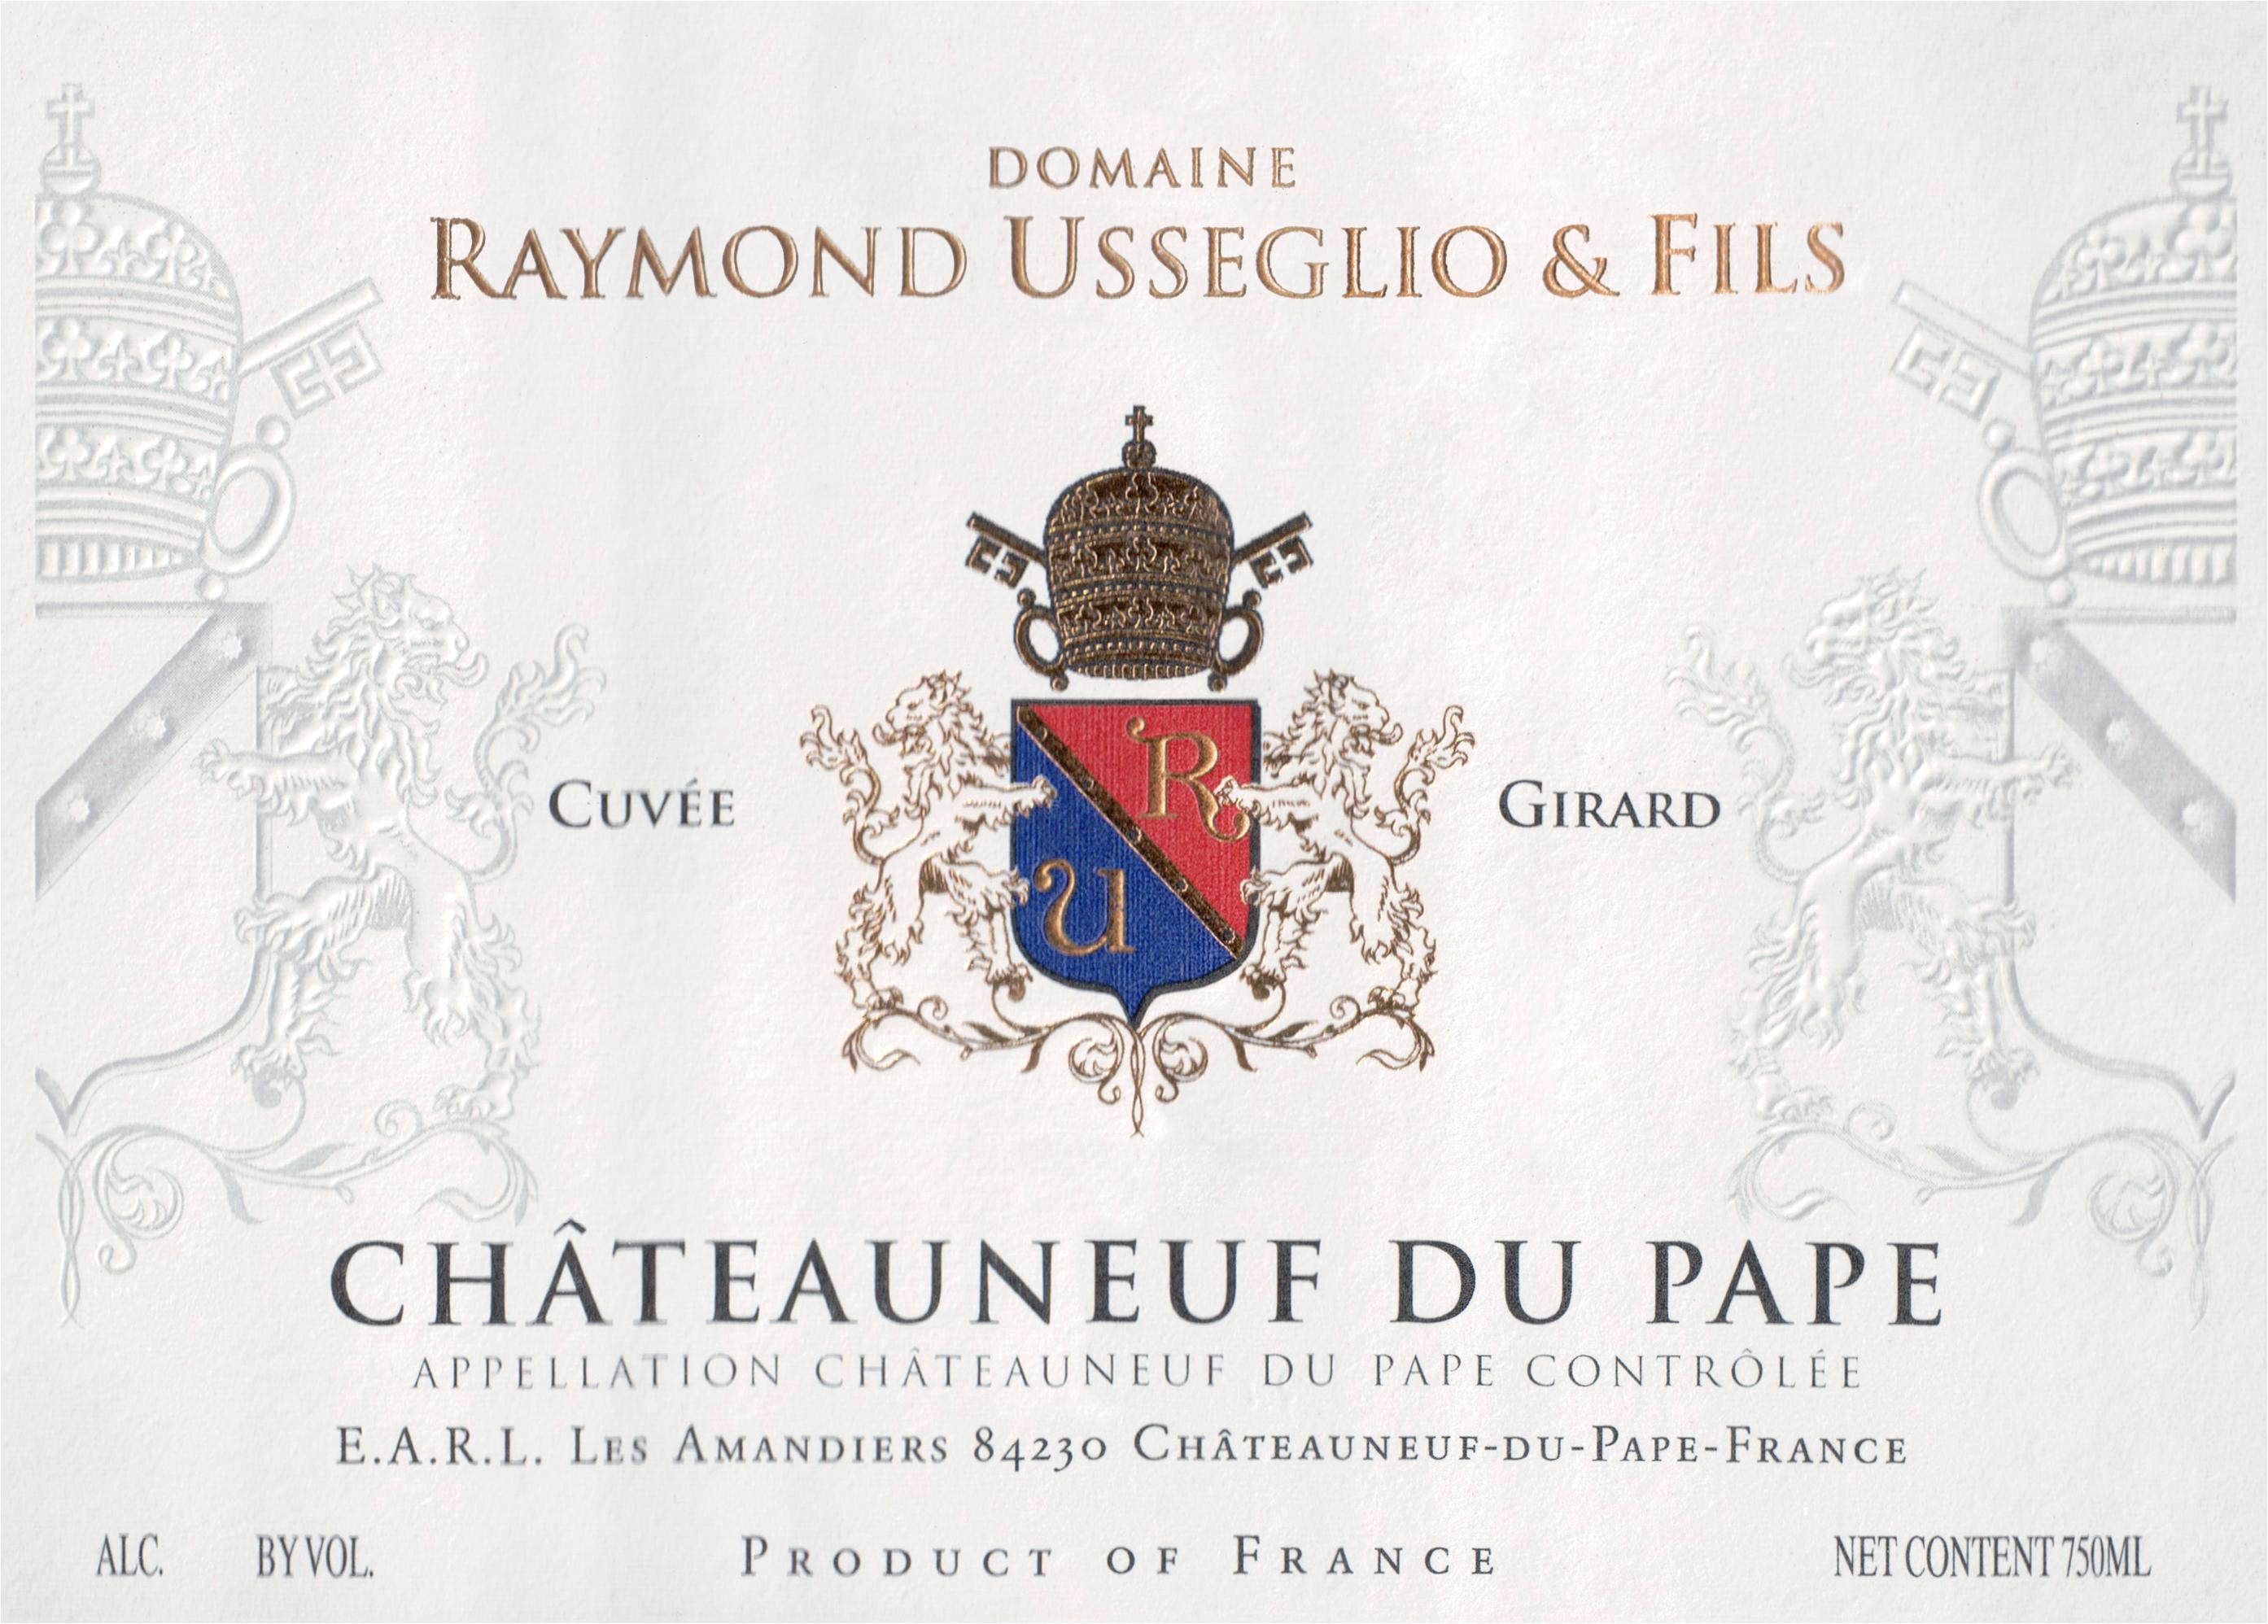 Domaine Raymond Usseglio Chateauneuf Du Pape Cuvee Girard 2018